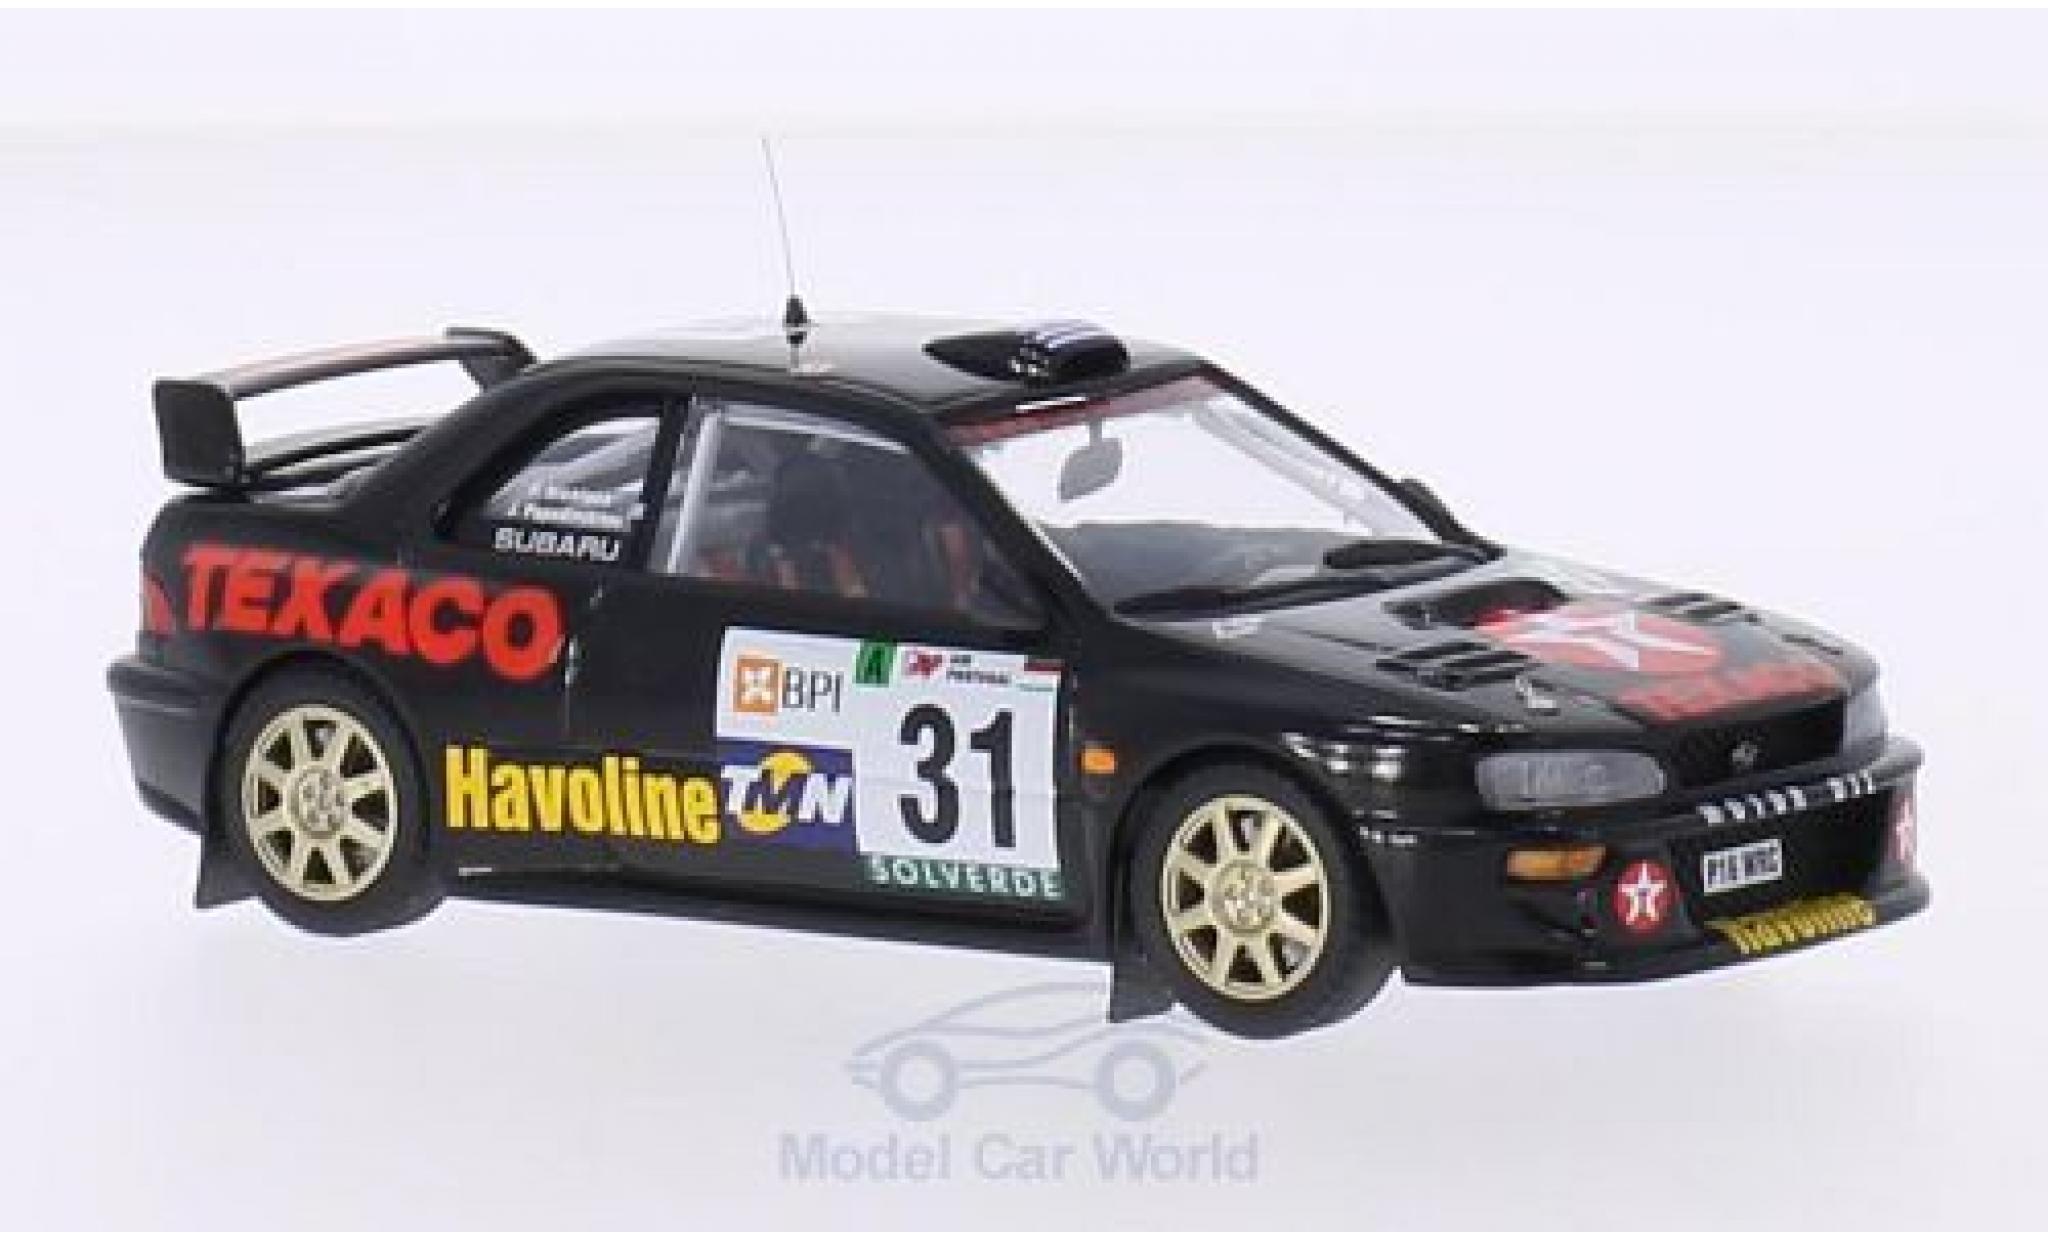 Subaru Impreza WRC 1/43 Trofeu No.31 Texaco Rallye WM Rallye Portugal 2000 I.Papadimitriou/N.Petropoulos